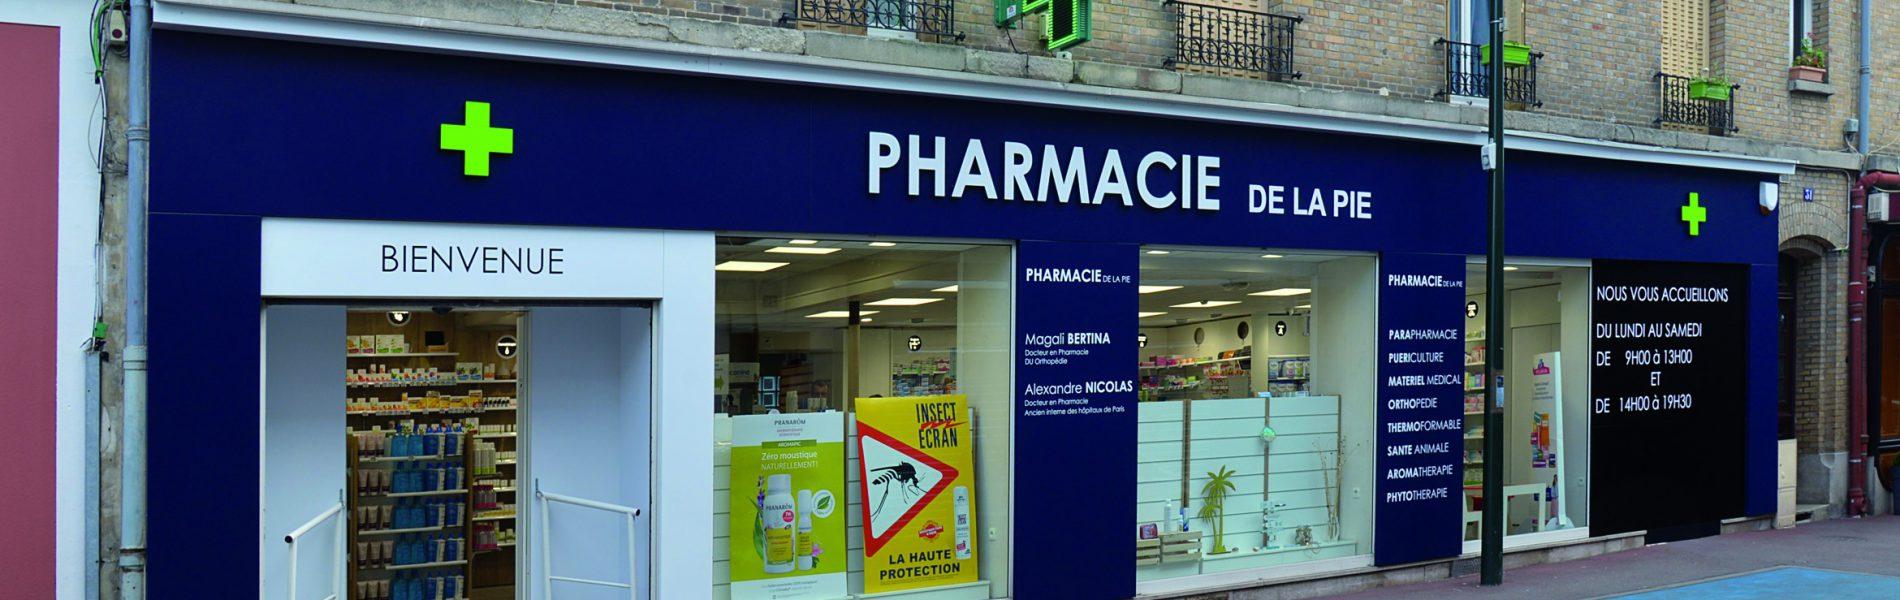 Pharmacie DE LA PIE - Image Homepage 1